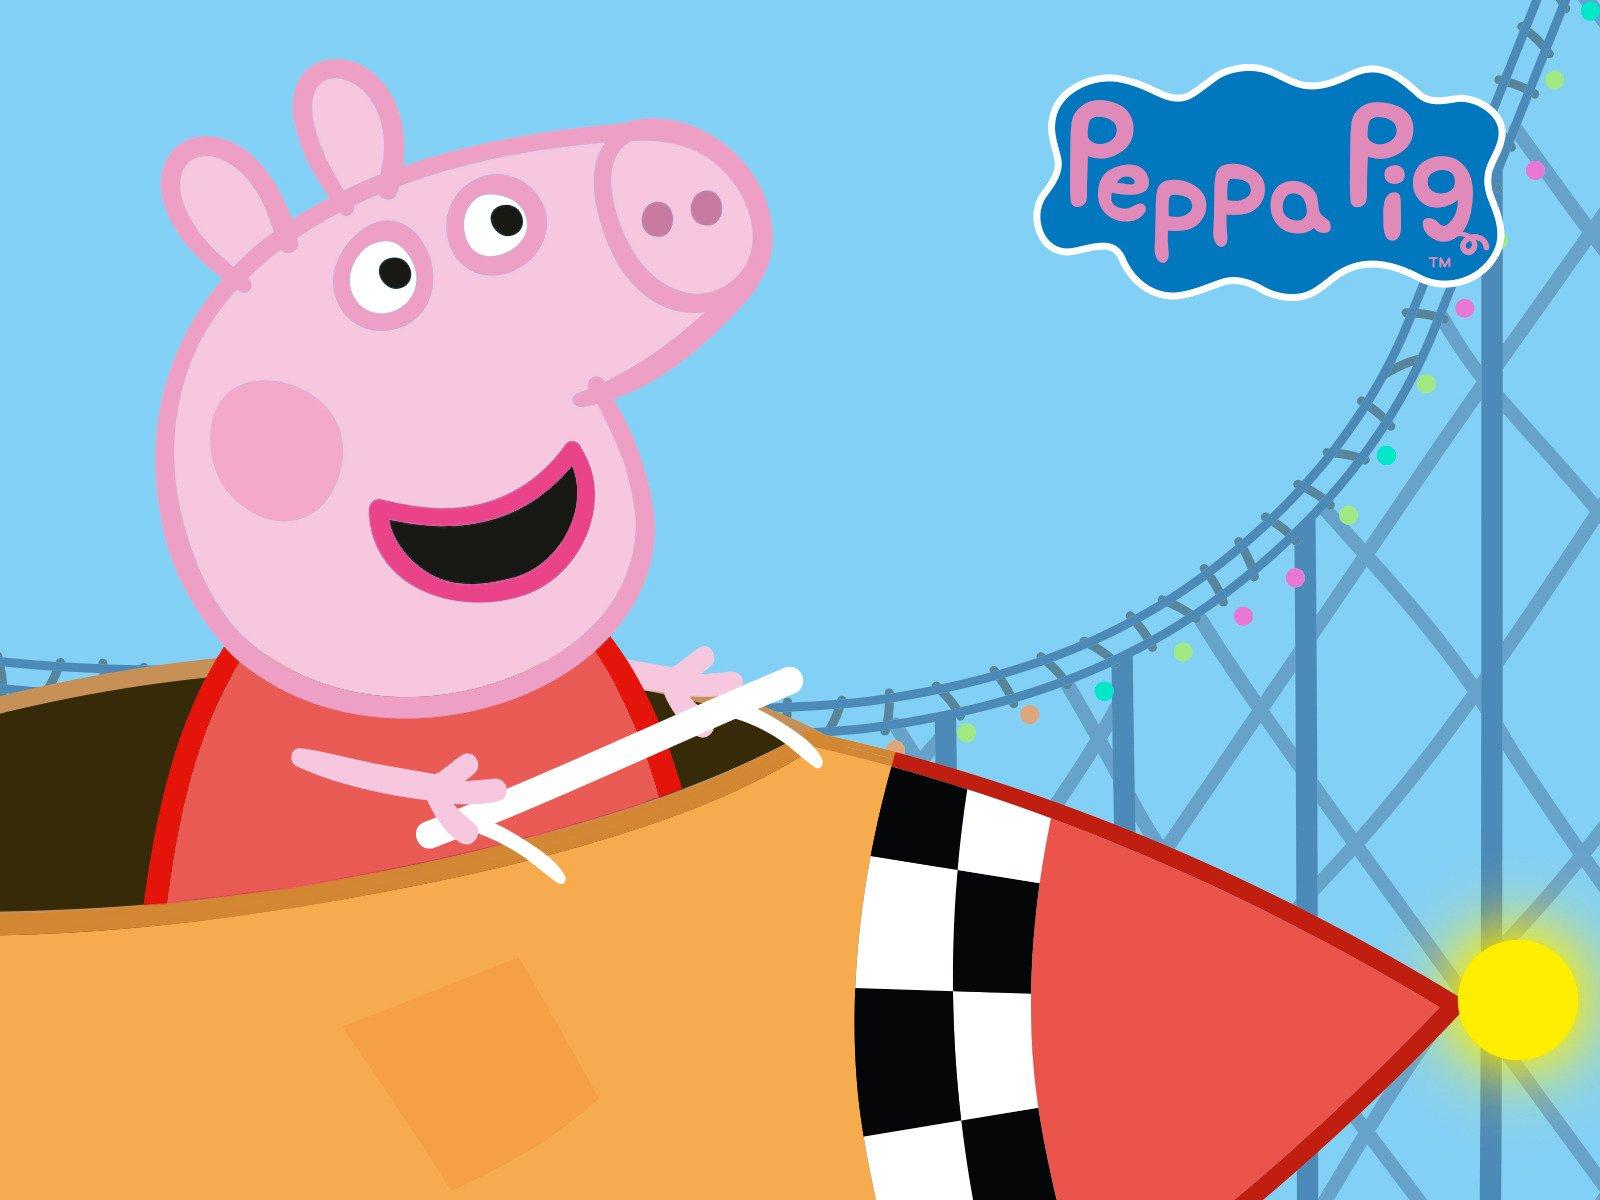 Amazon co uk: Watch Peppa Pig - Volume 7 | Prime Video